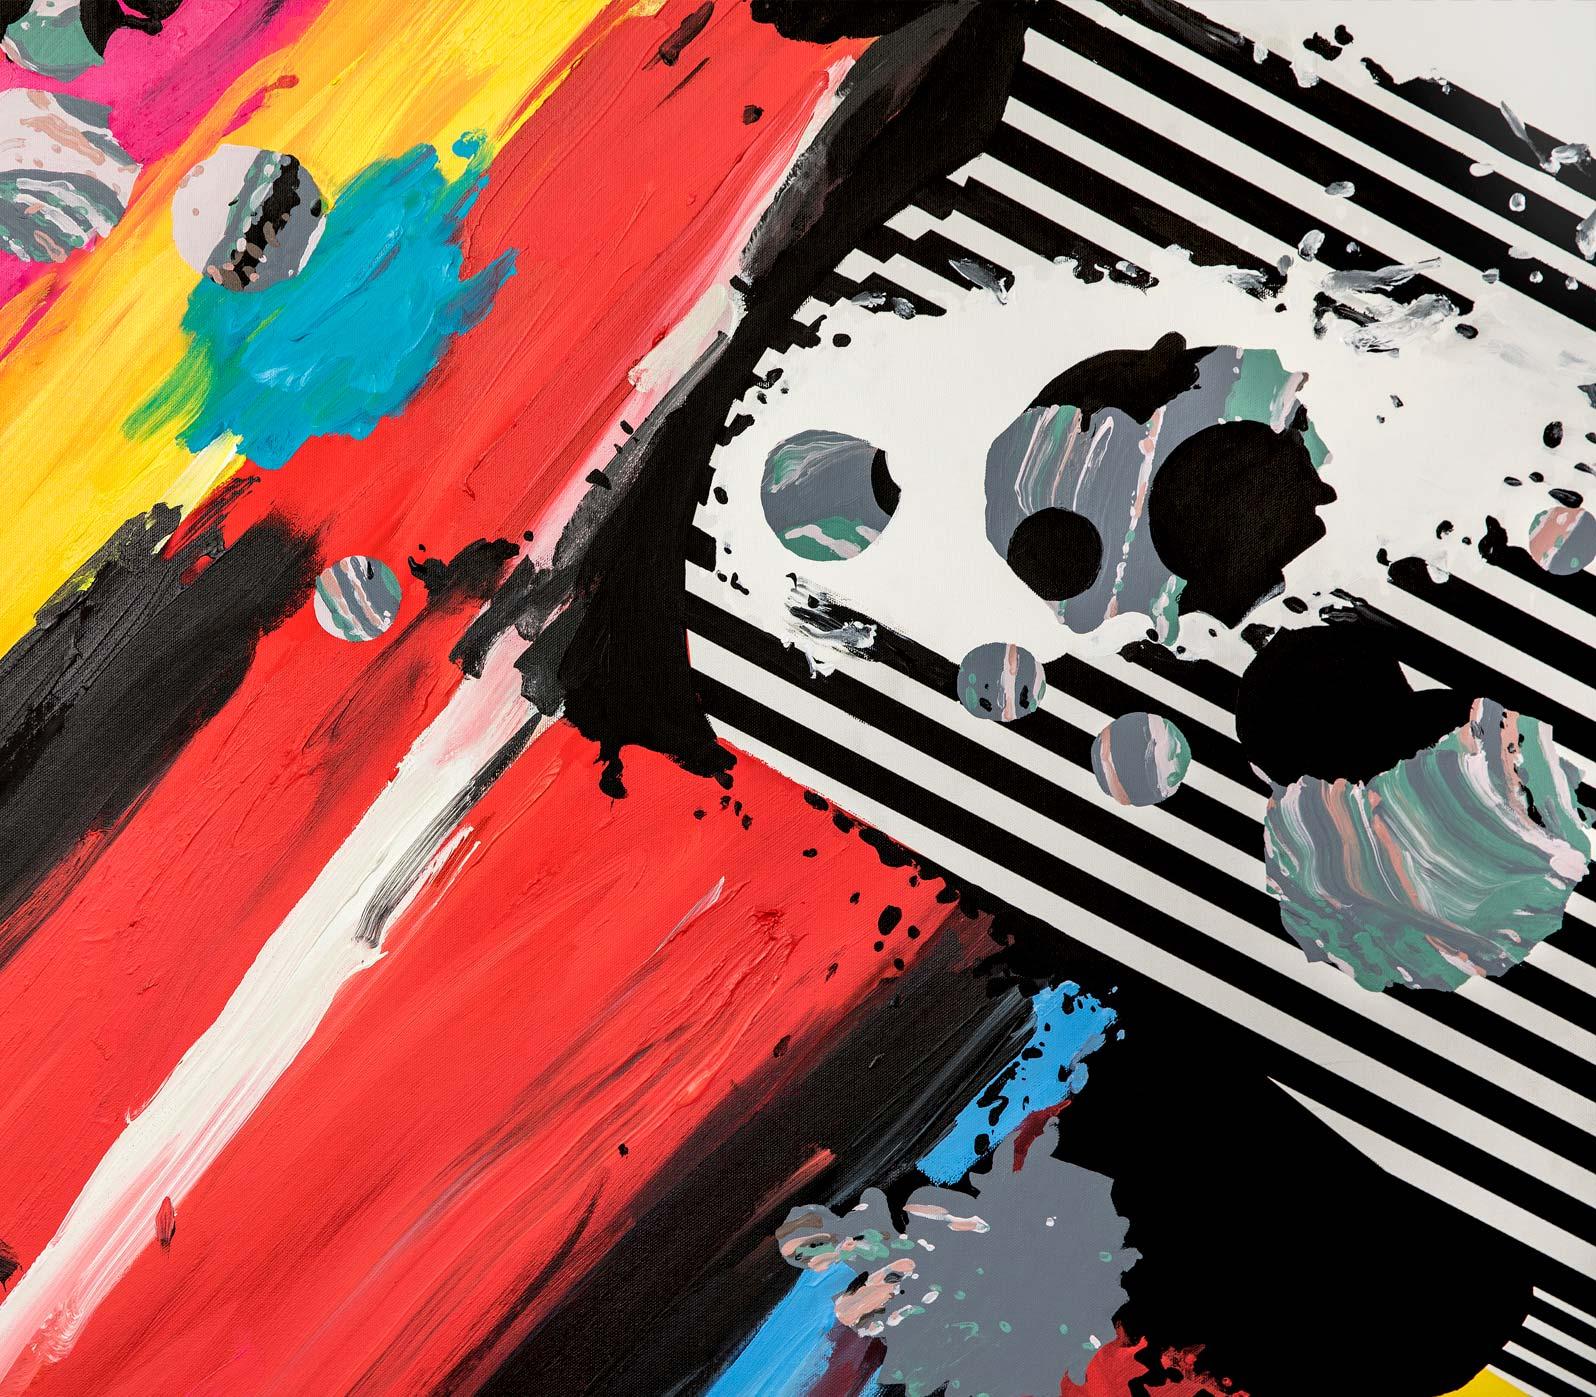 Anca Stefanescu | Modern Acrylic Painting Artists, AxiomOfChoice